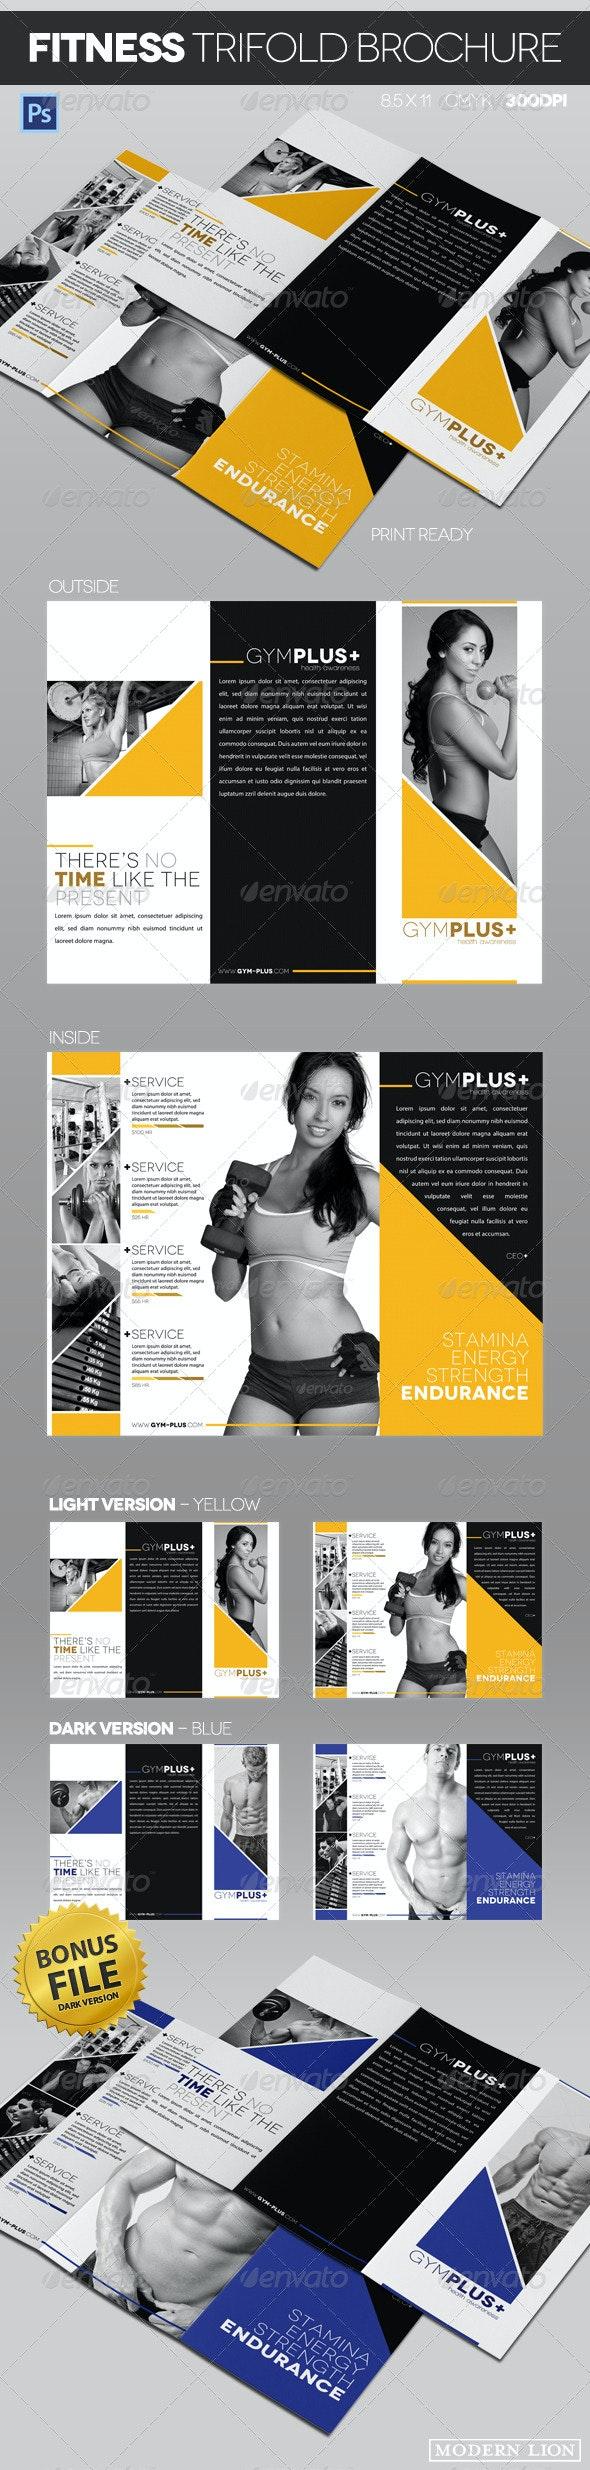 Fitness Gym Trifold Brochure - Informational Brochures